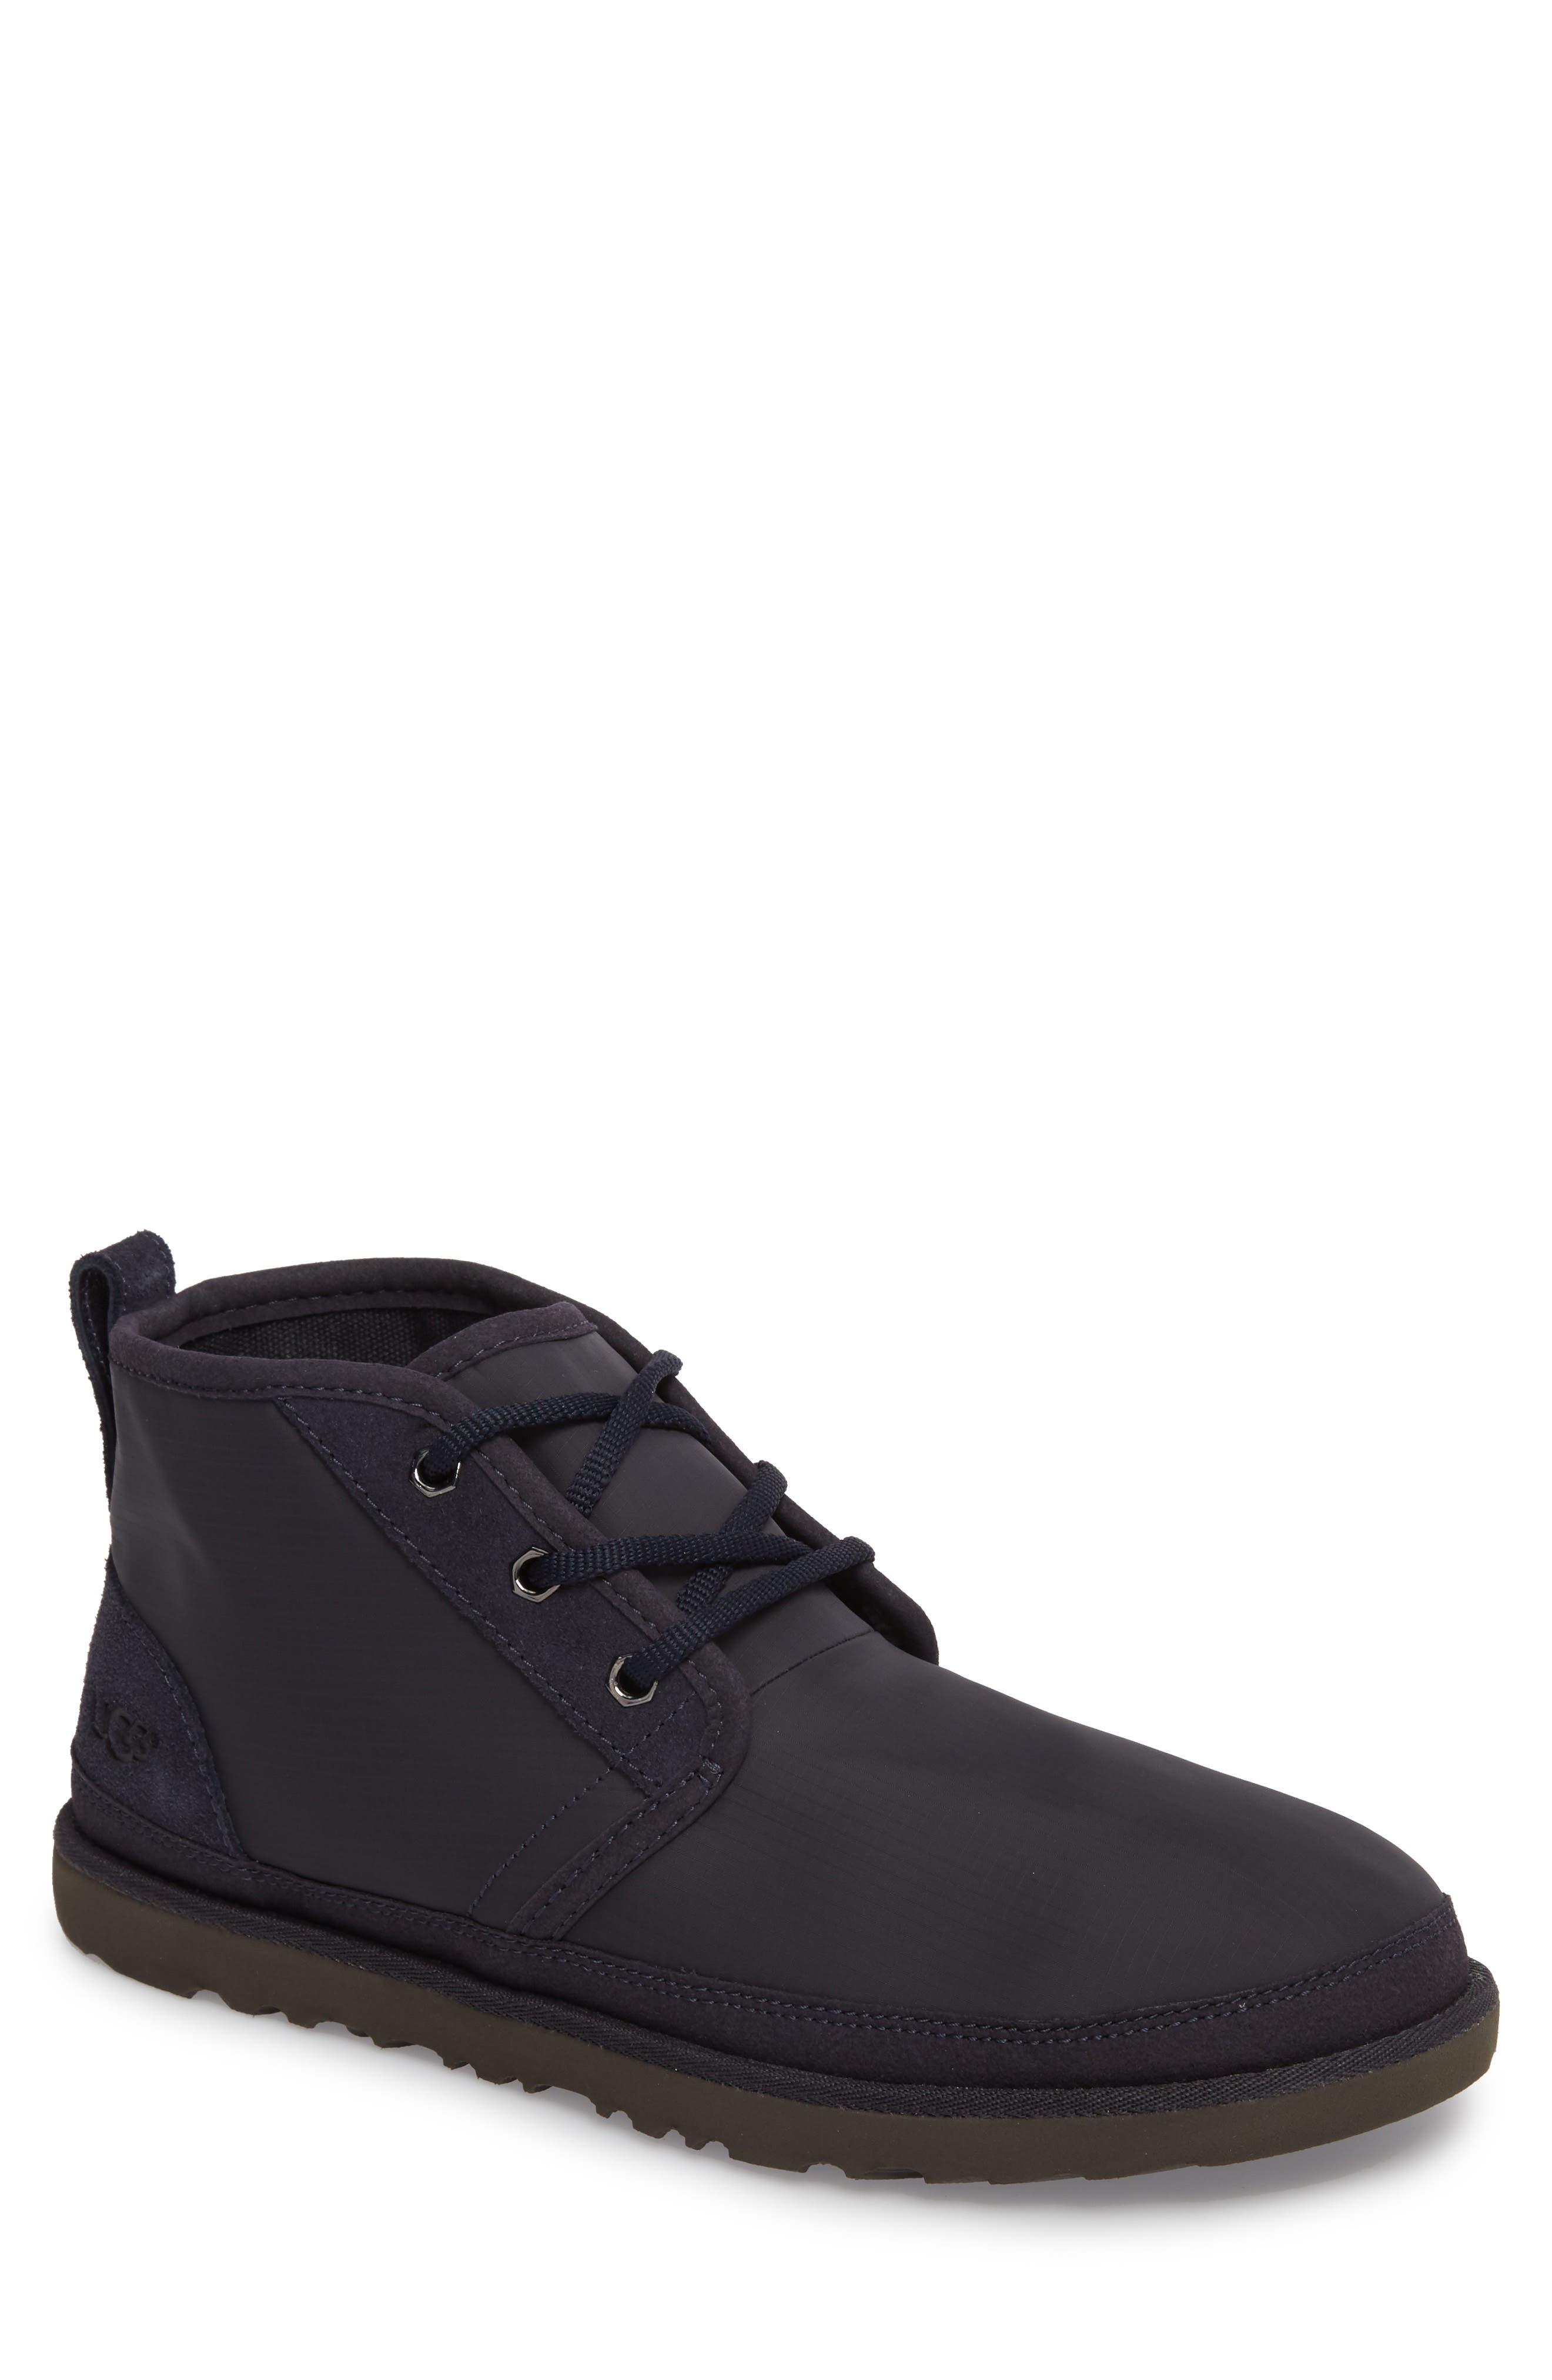 Neumel Ripstop Chukka Boot,                             Main thumbnail 1, color,                             True Navy Leather